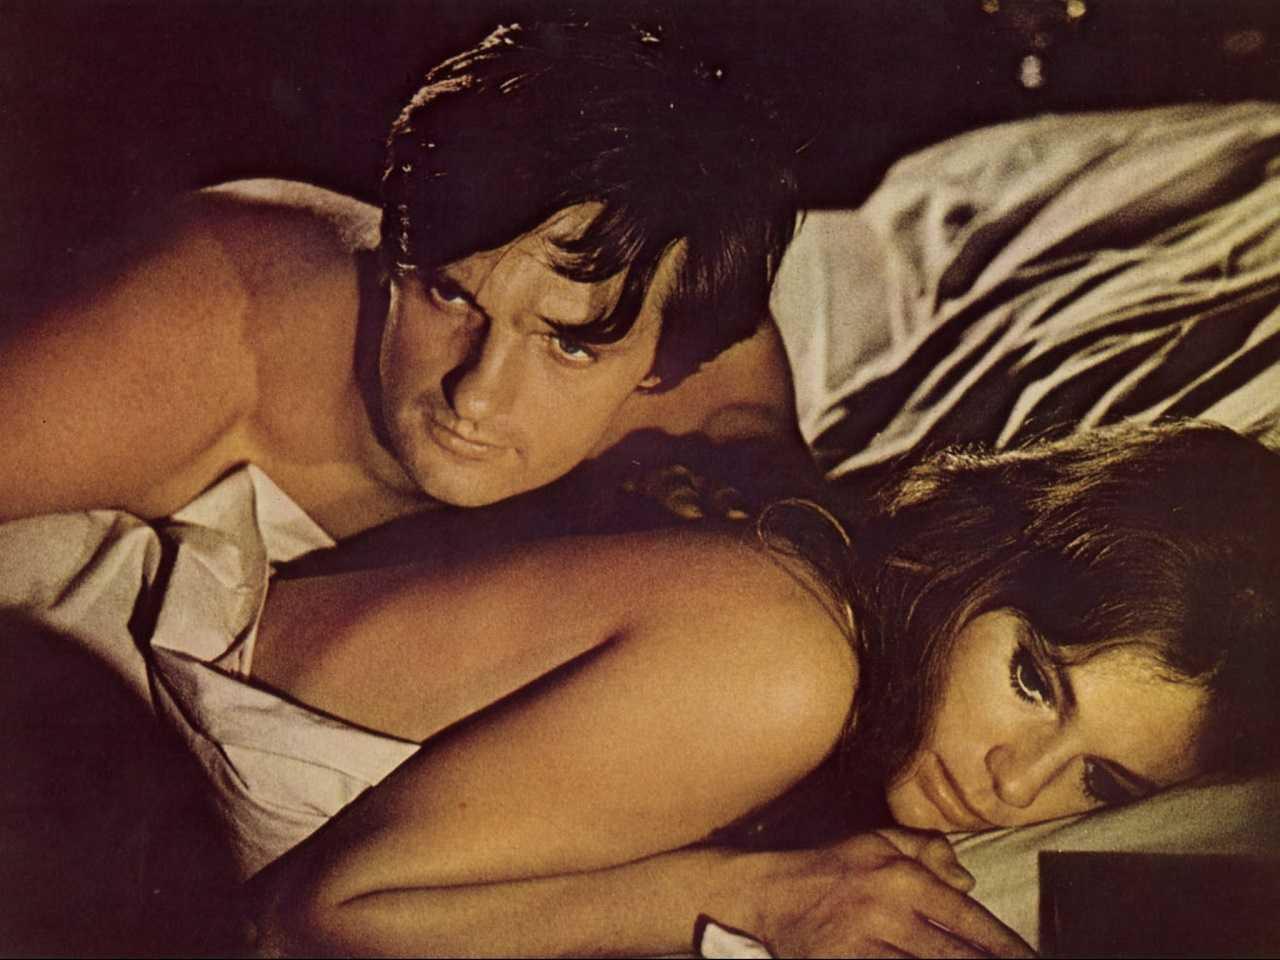 Jacqueline Bisset with husband Alan Alda in The Mephisto Waltz (1971)